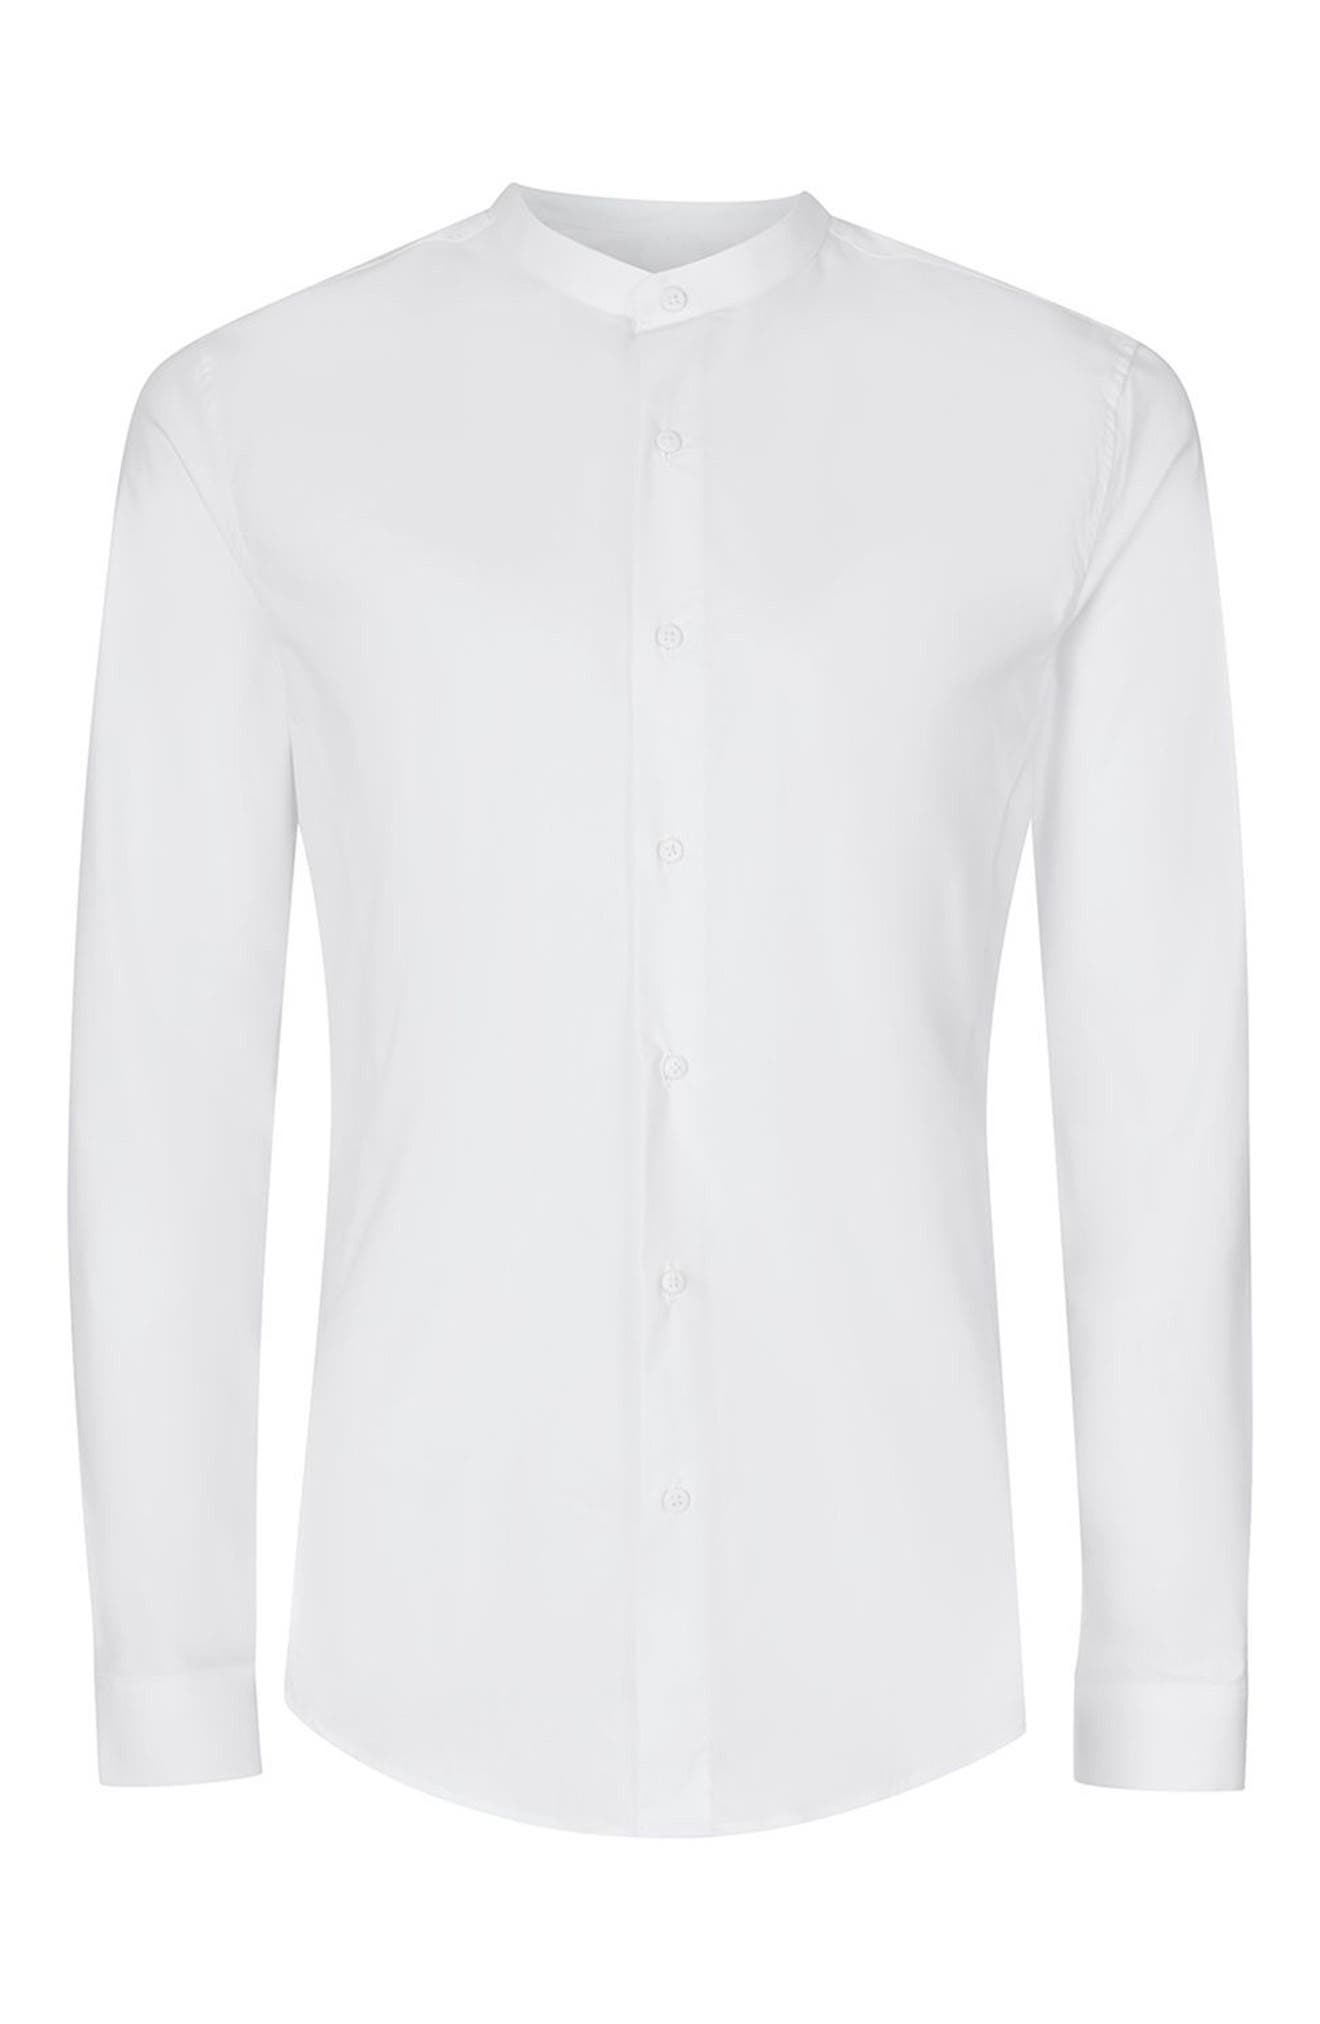 Band Collar Skinny Fit Dress Shirt,                             Alternate thumbnail 6, color,                             WHITE